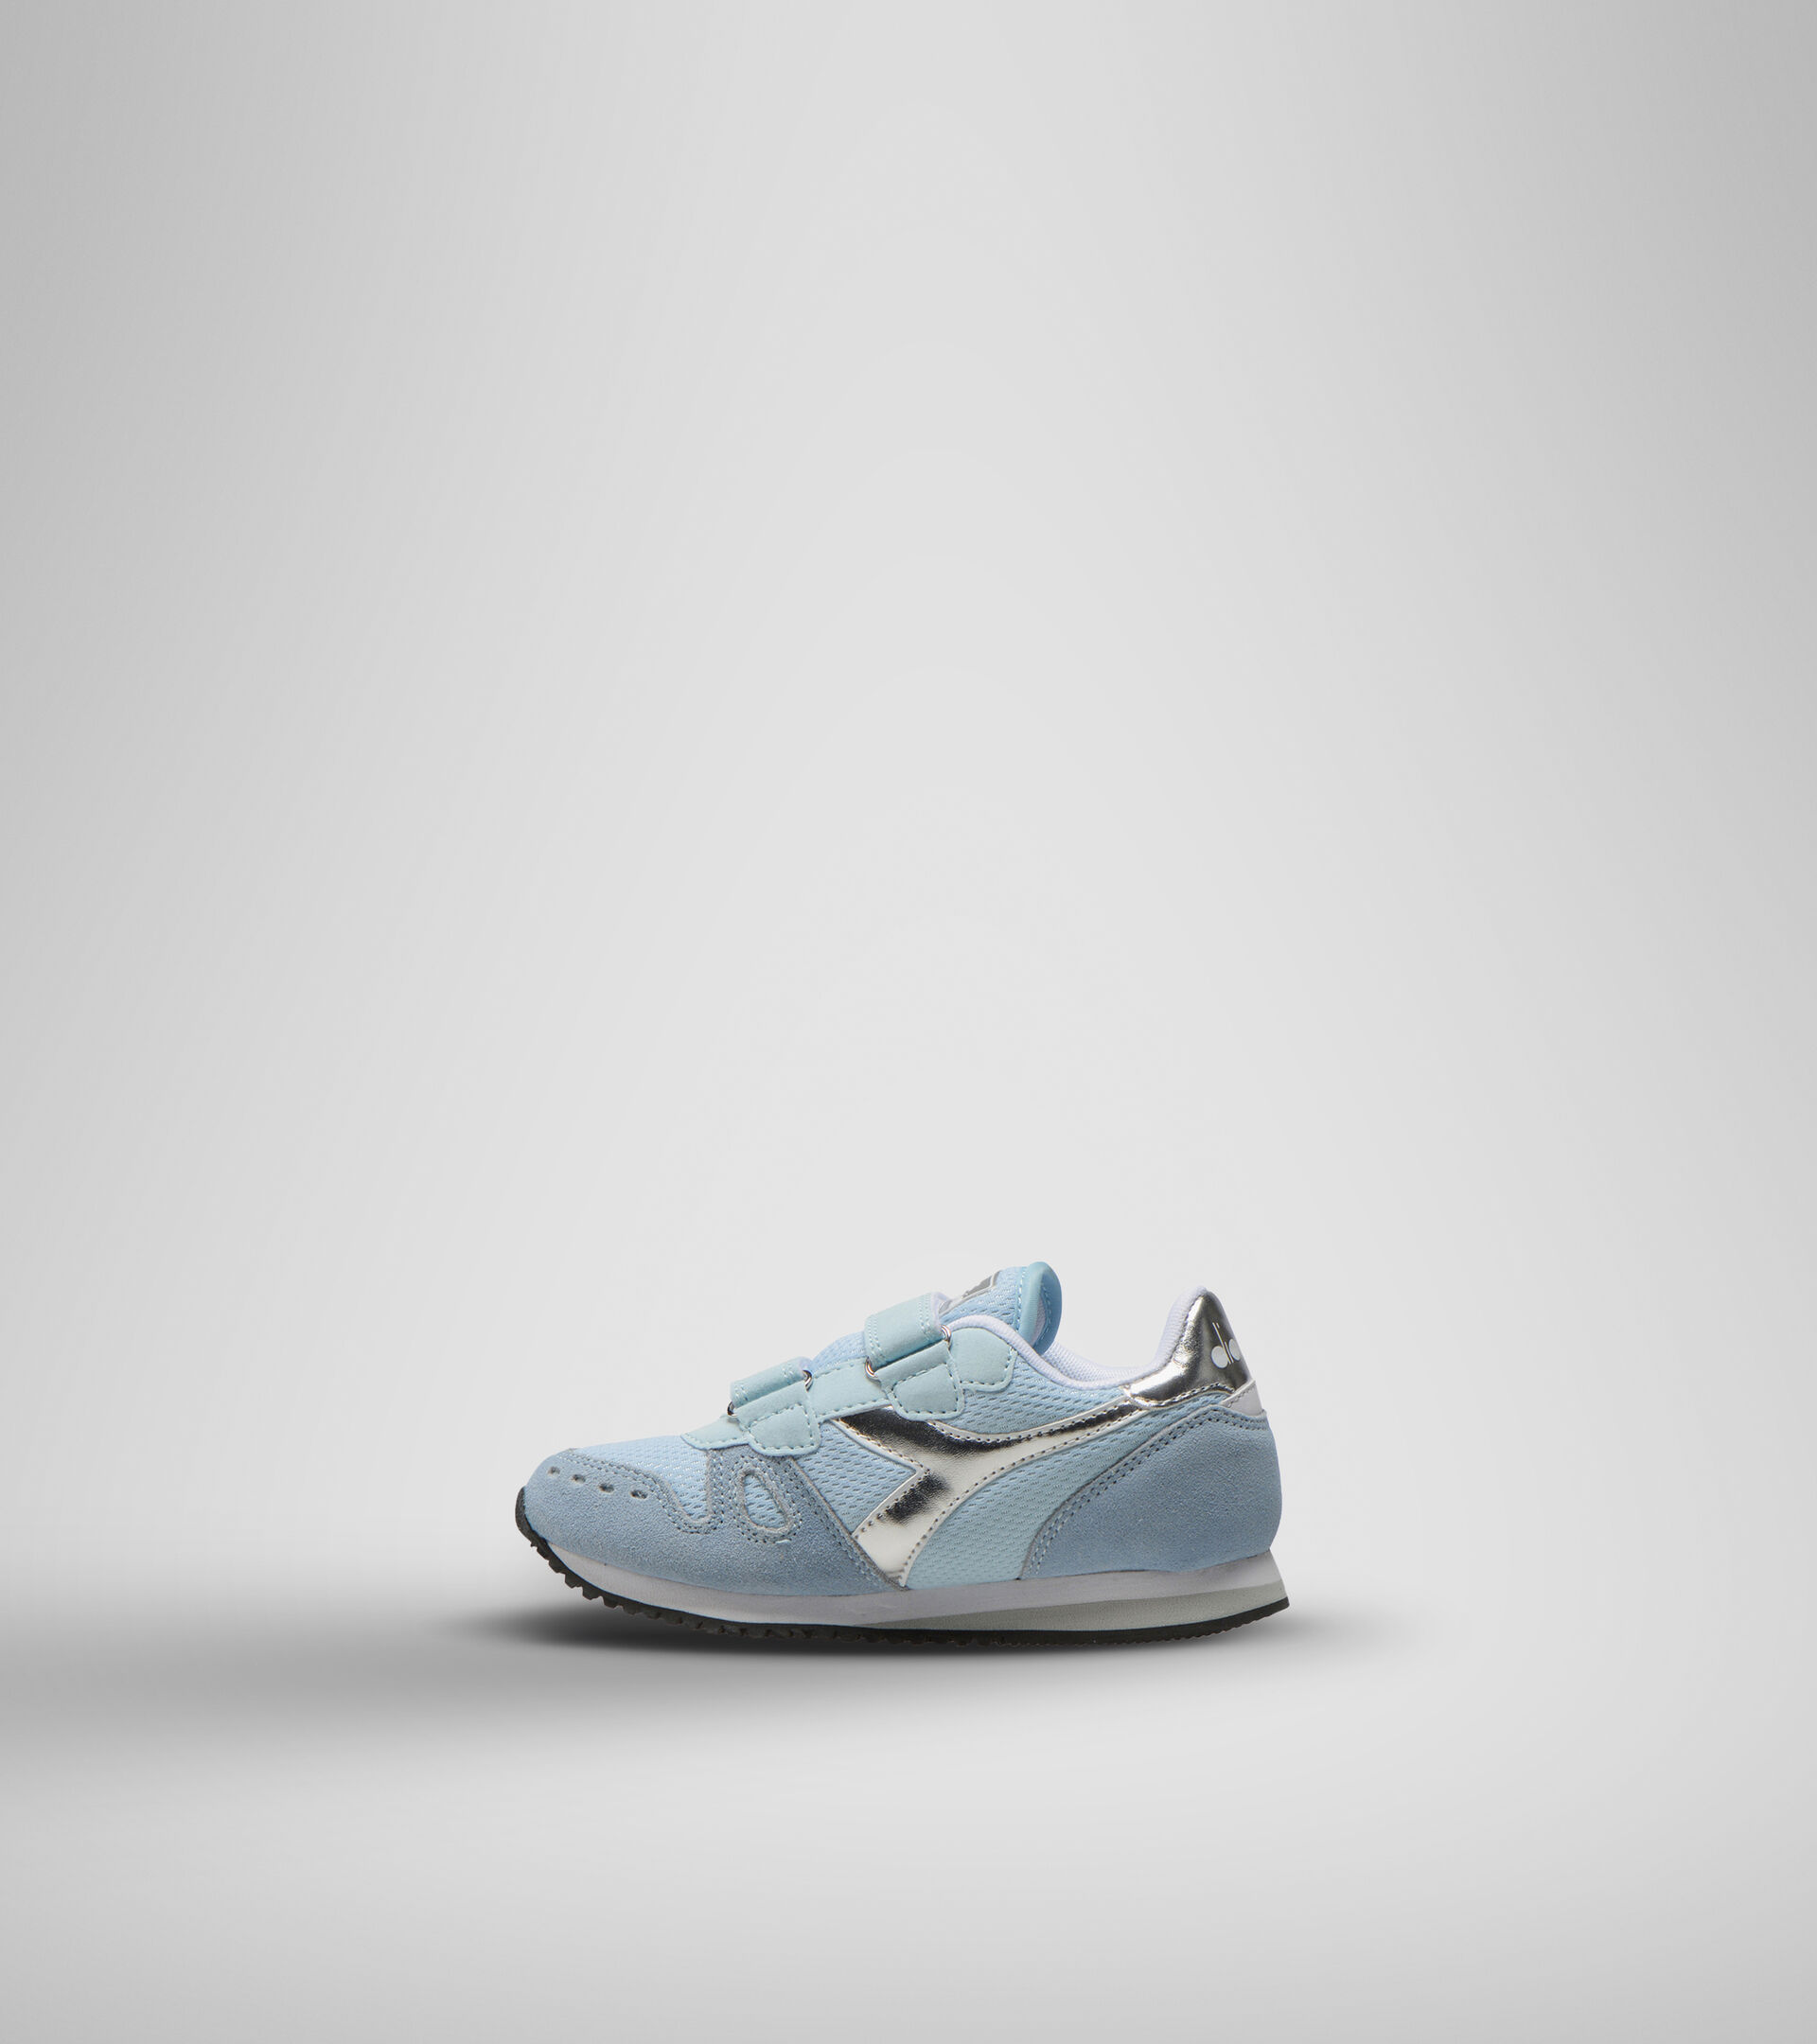 Footwear Sport BAMBINO SIMPLE RUN PS GIRL AZUL LUZ DE LA ESTRELLAS Diadora